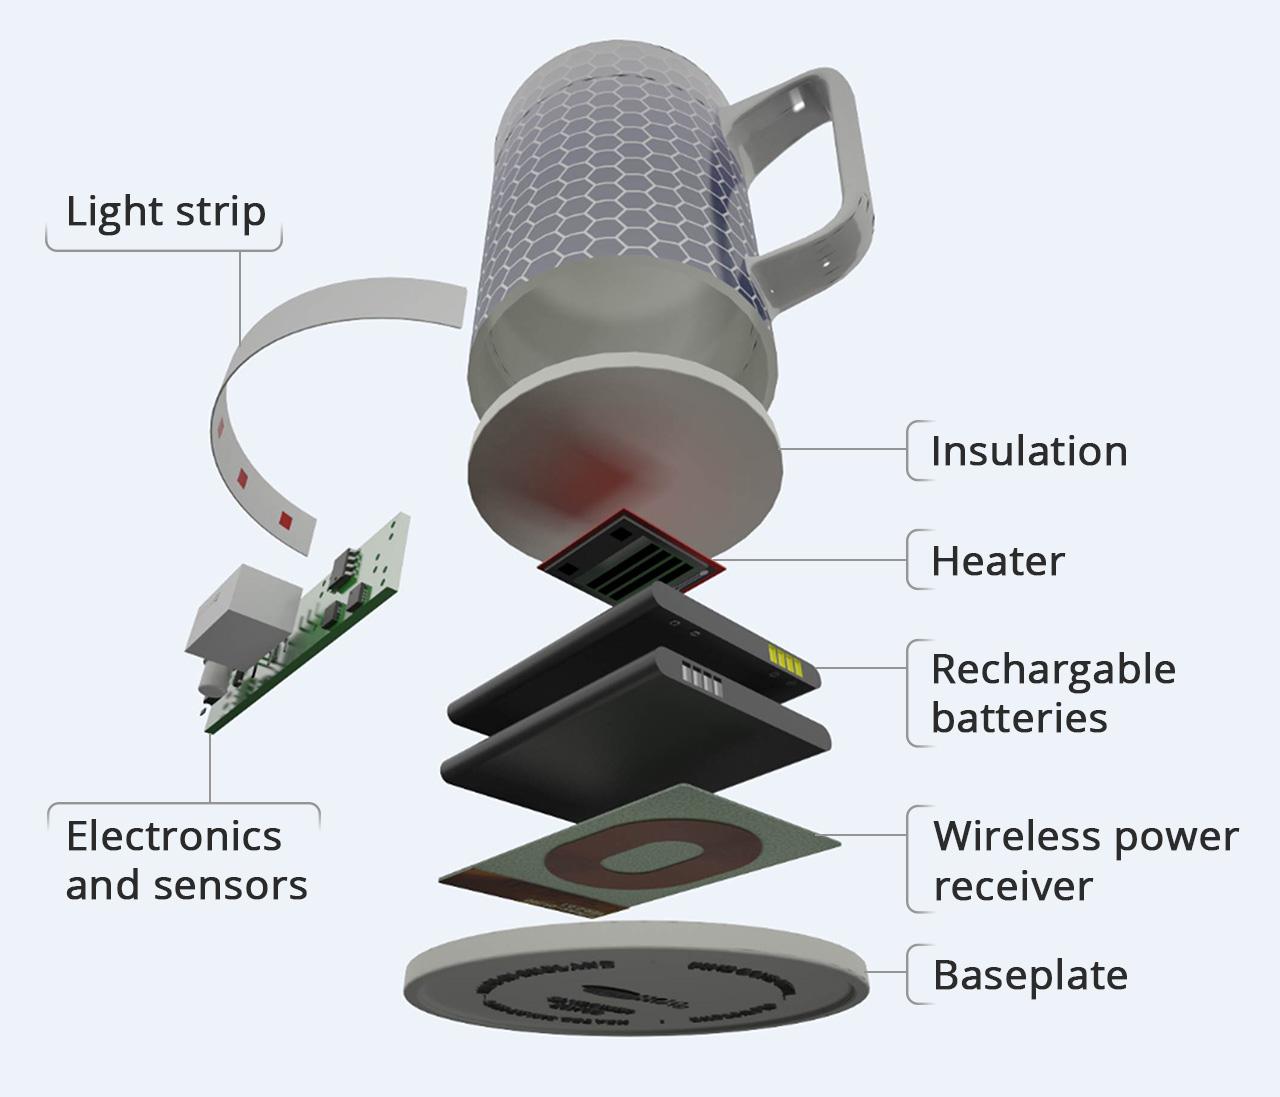 glowstone-heated-smart-mug-fine-bone-china-exploded-labeled